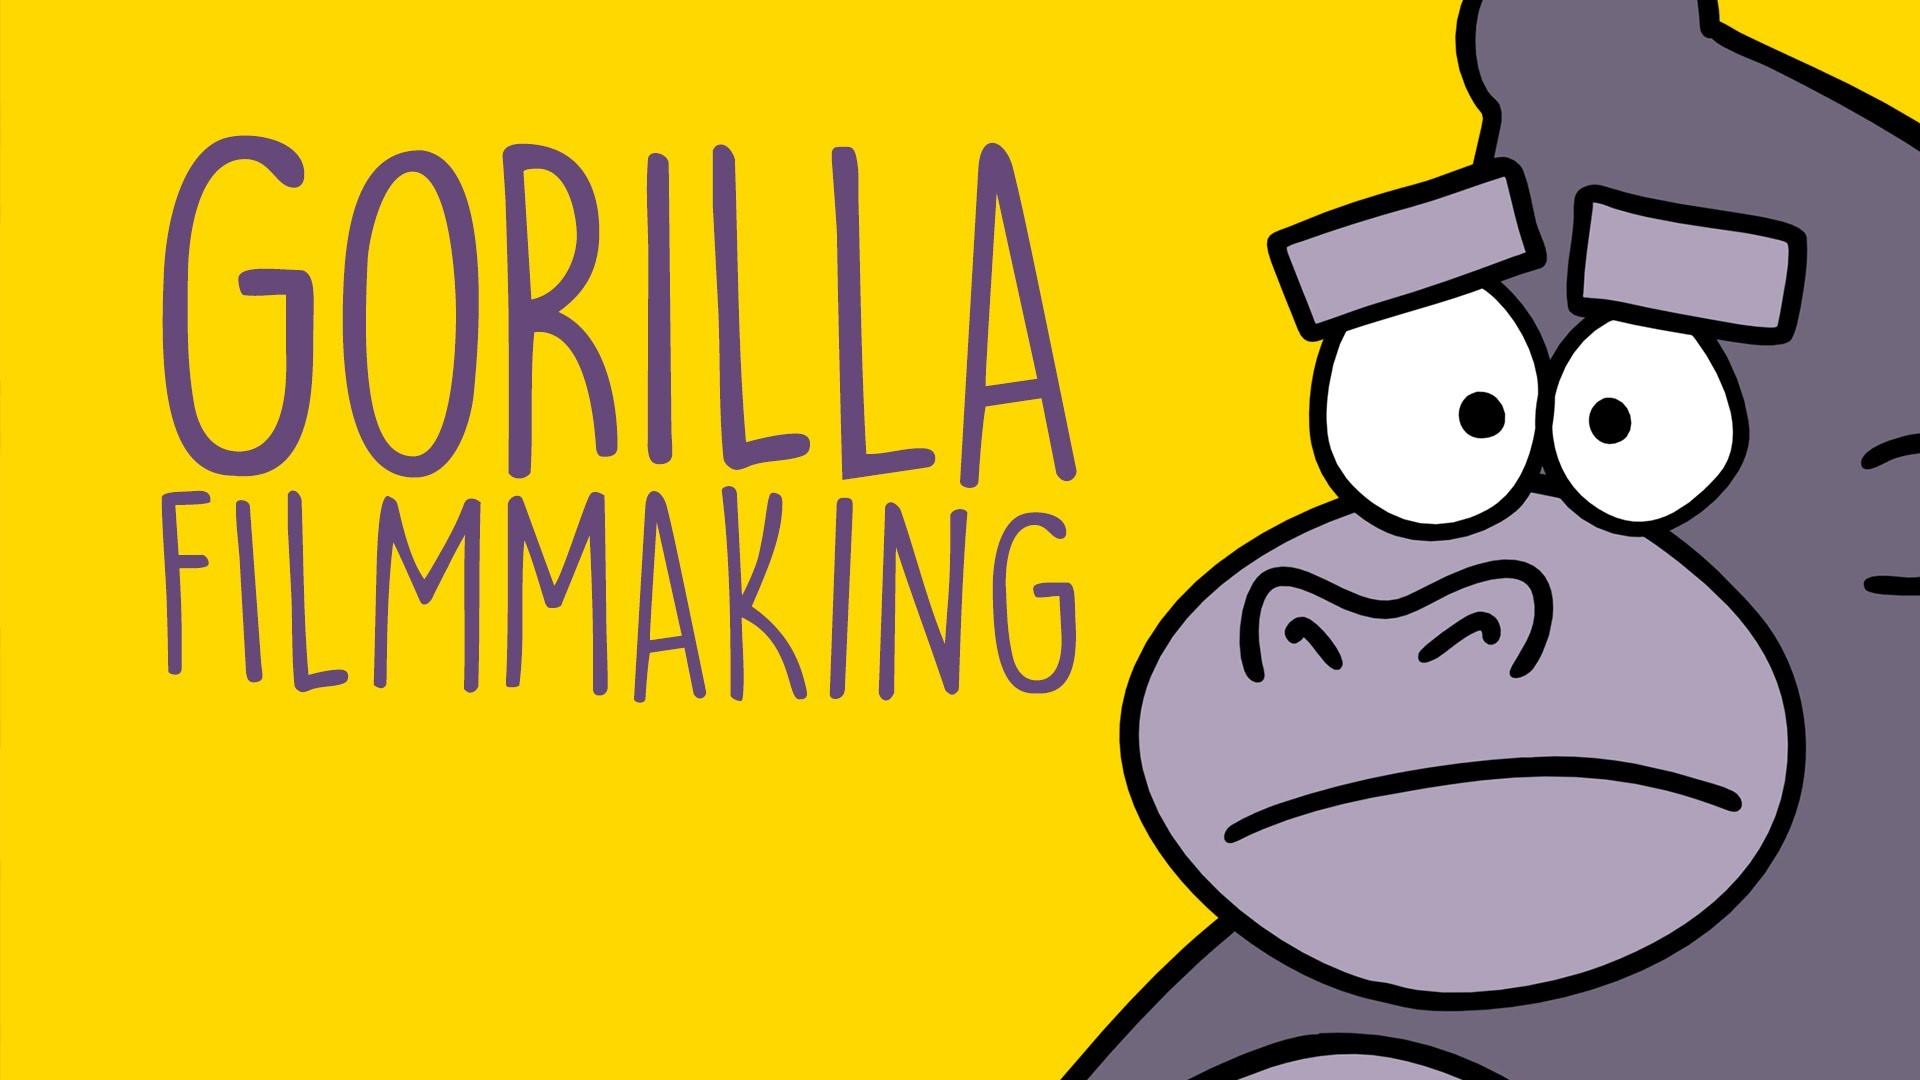 Gorilla Filmmaking